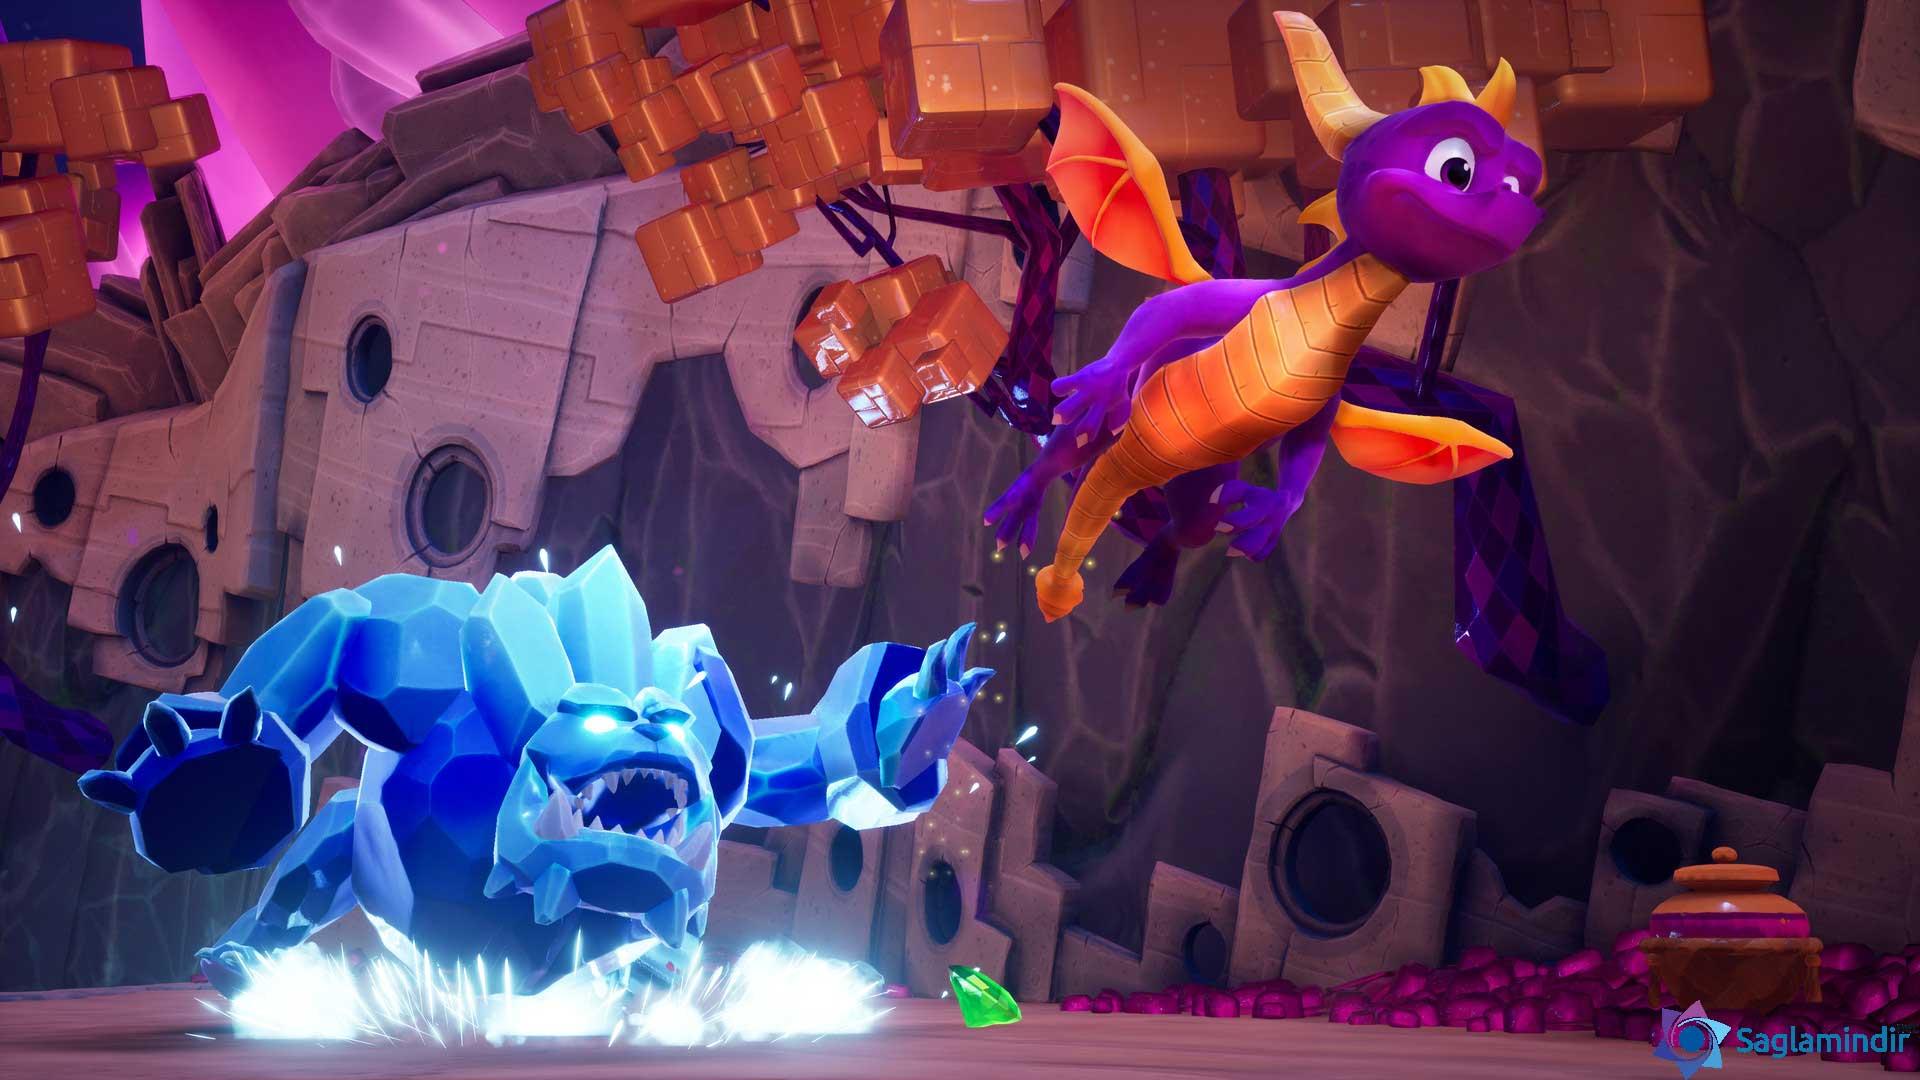 Spyro Reignited Trilogy saglamindir